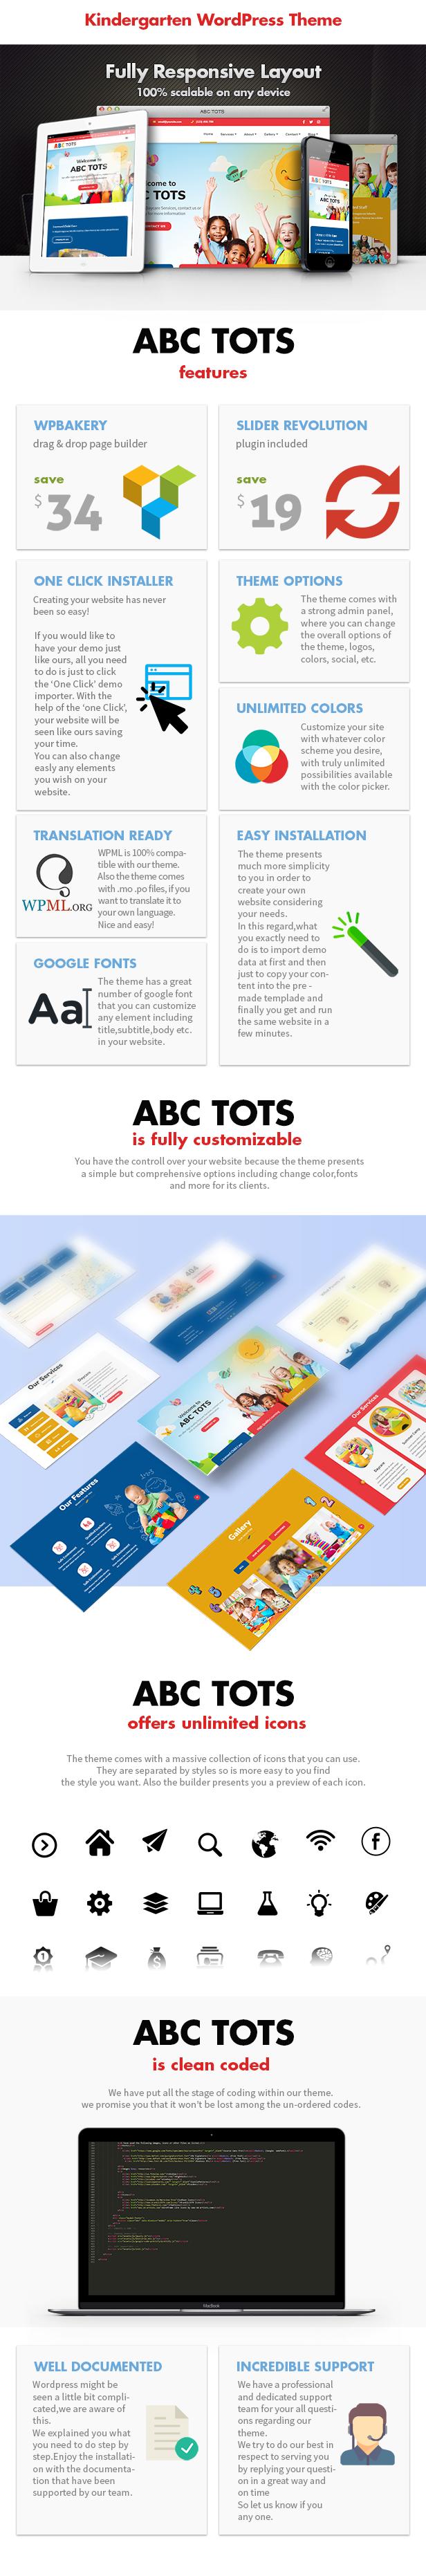 Abc Tots - Kindergarten Theme - 3